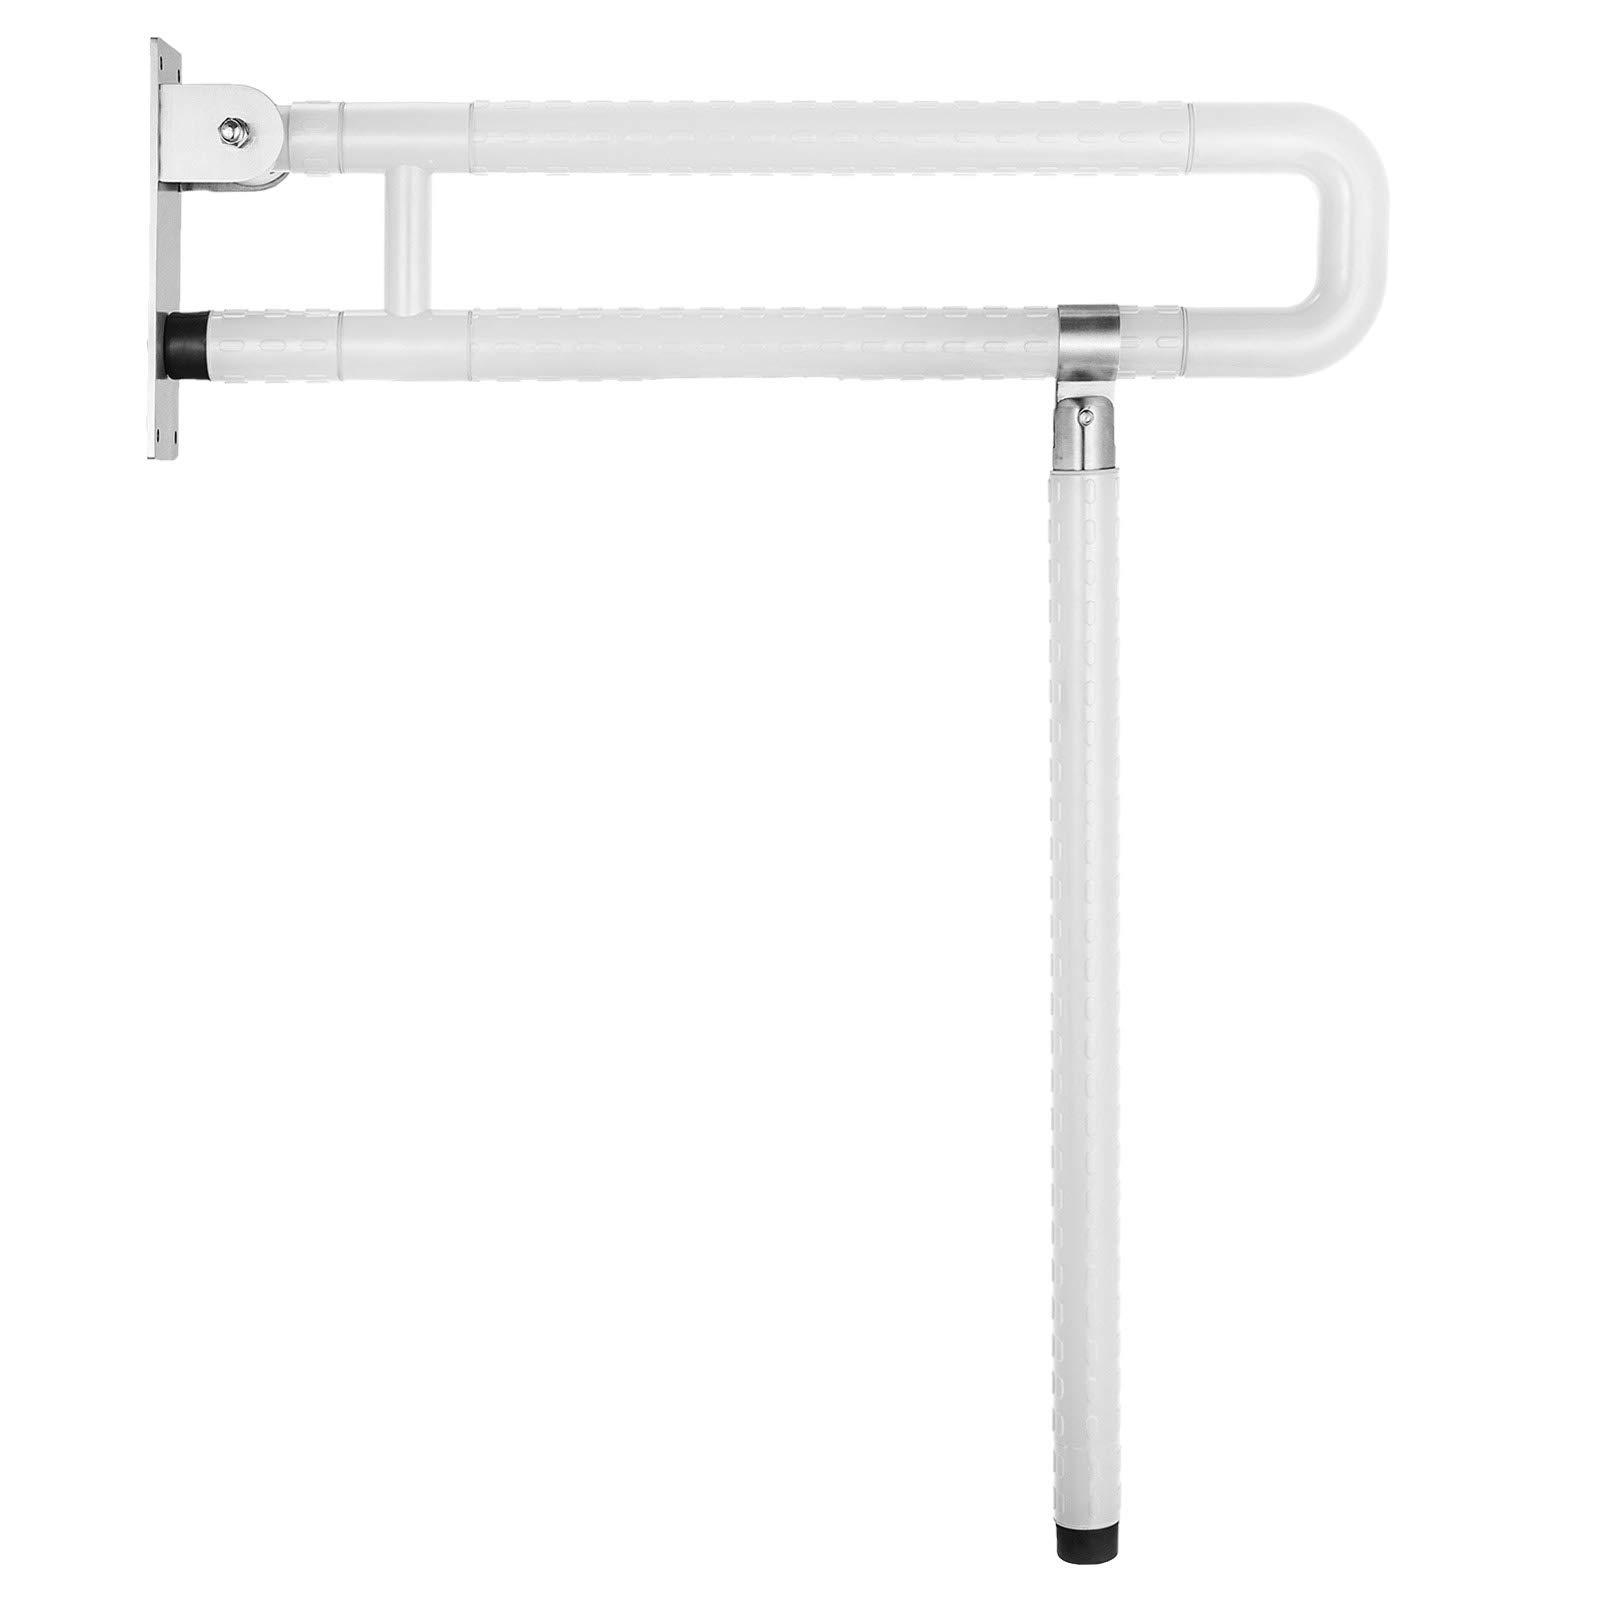 VEVOR Foldable Toilet Grab Bar Safety Frame Rails Flip-Up Skid Resistance Handicap Bathroom Seat Support Bar Toilet Hand Grips for Home Hotel Disabled Aid Pregnant Elderly R-Shape Rail (White R) by VEVOR